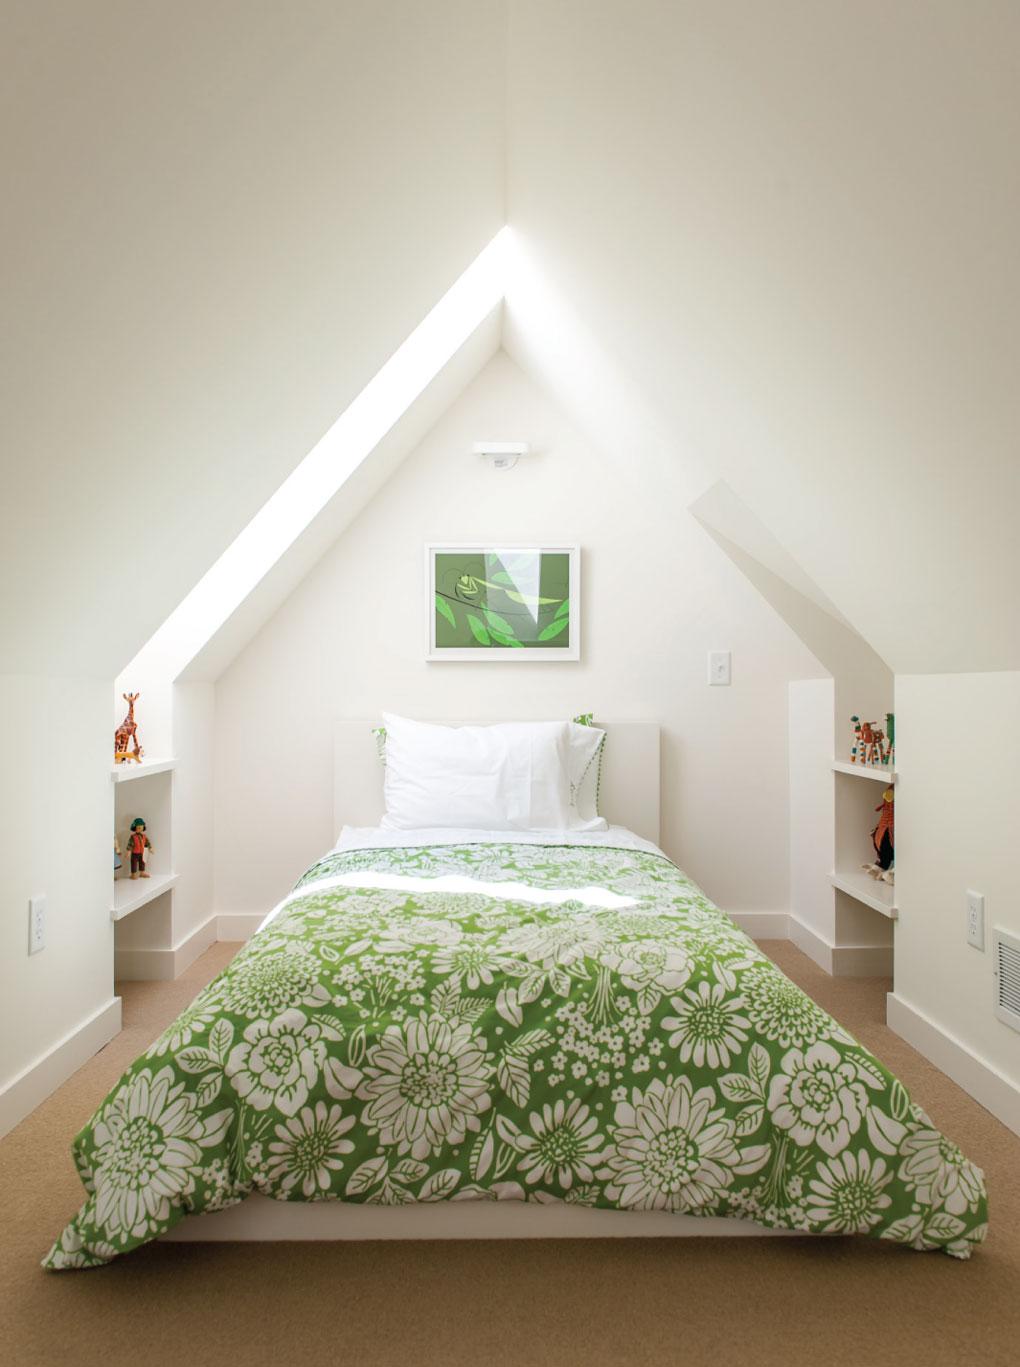 Second-floor bedroom features natural light and green motif